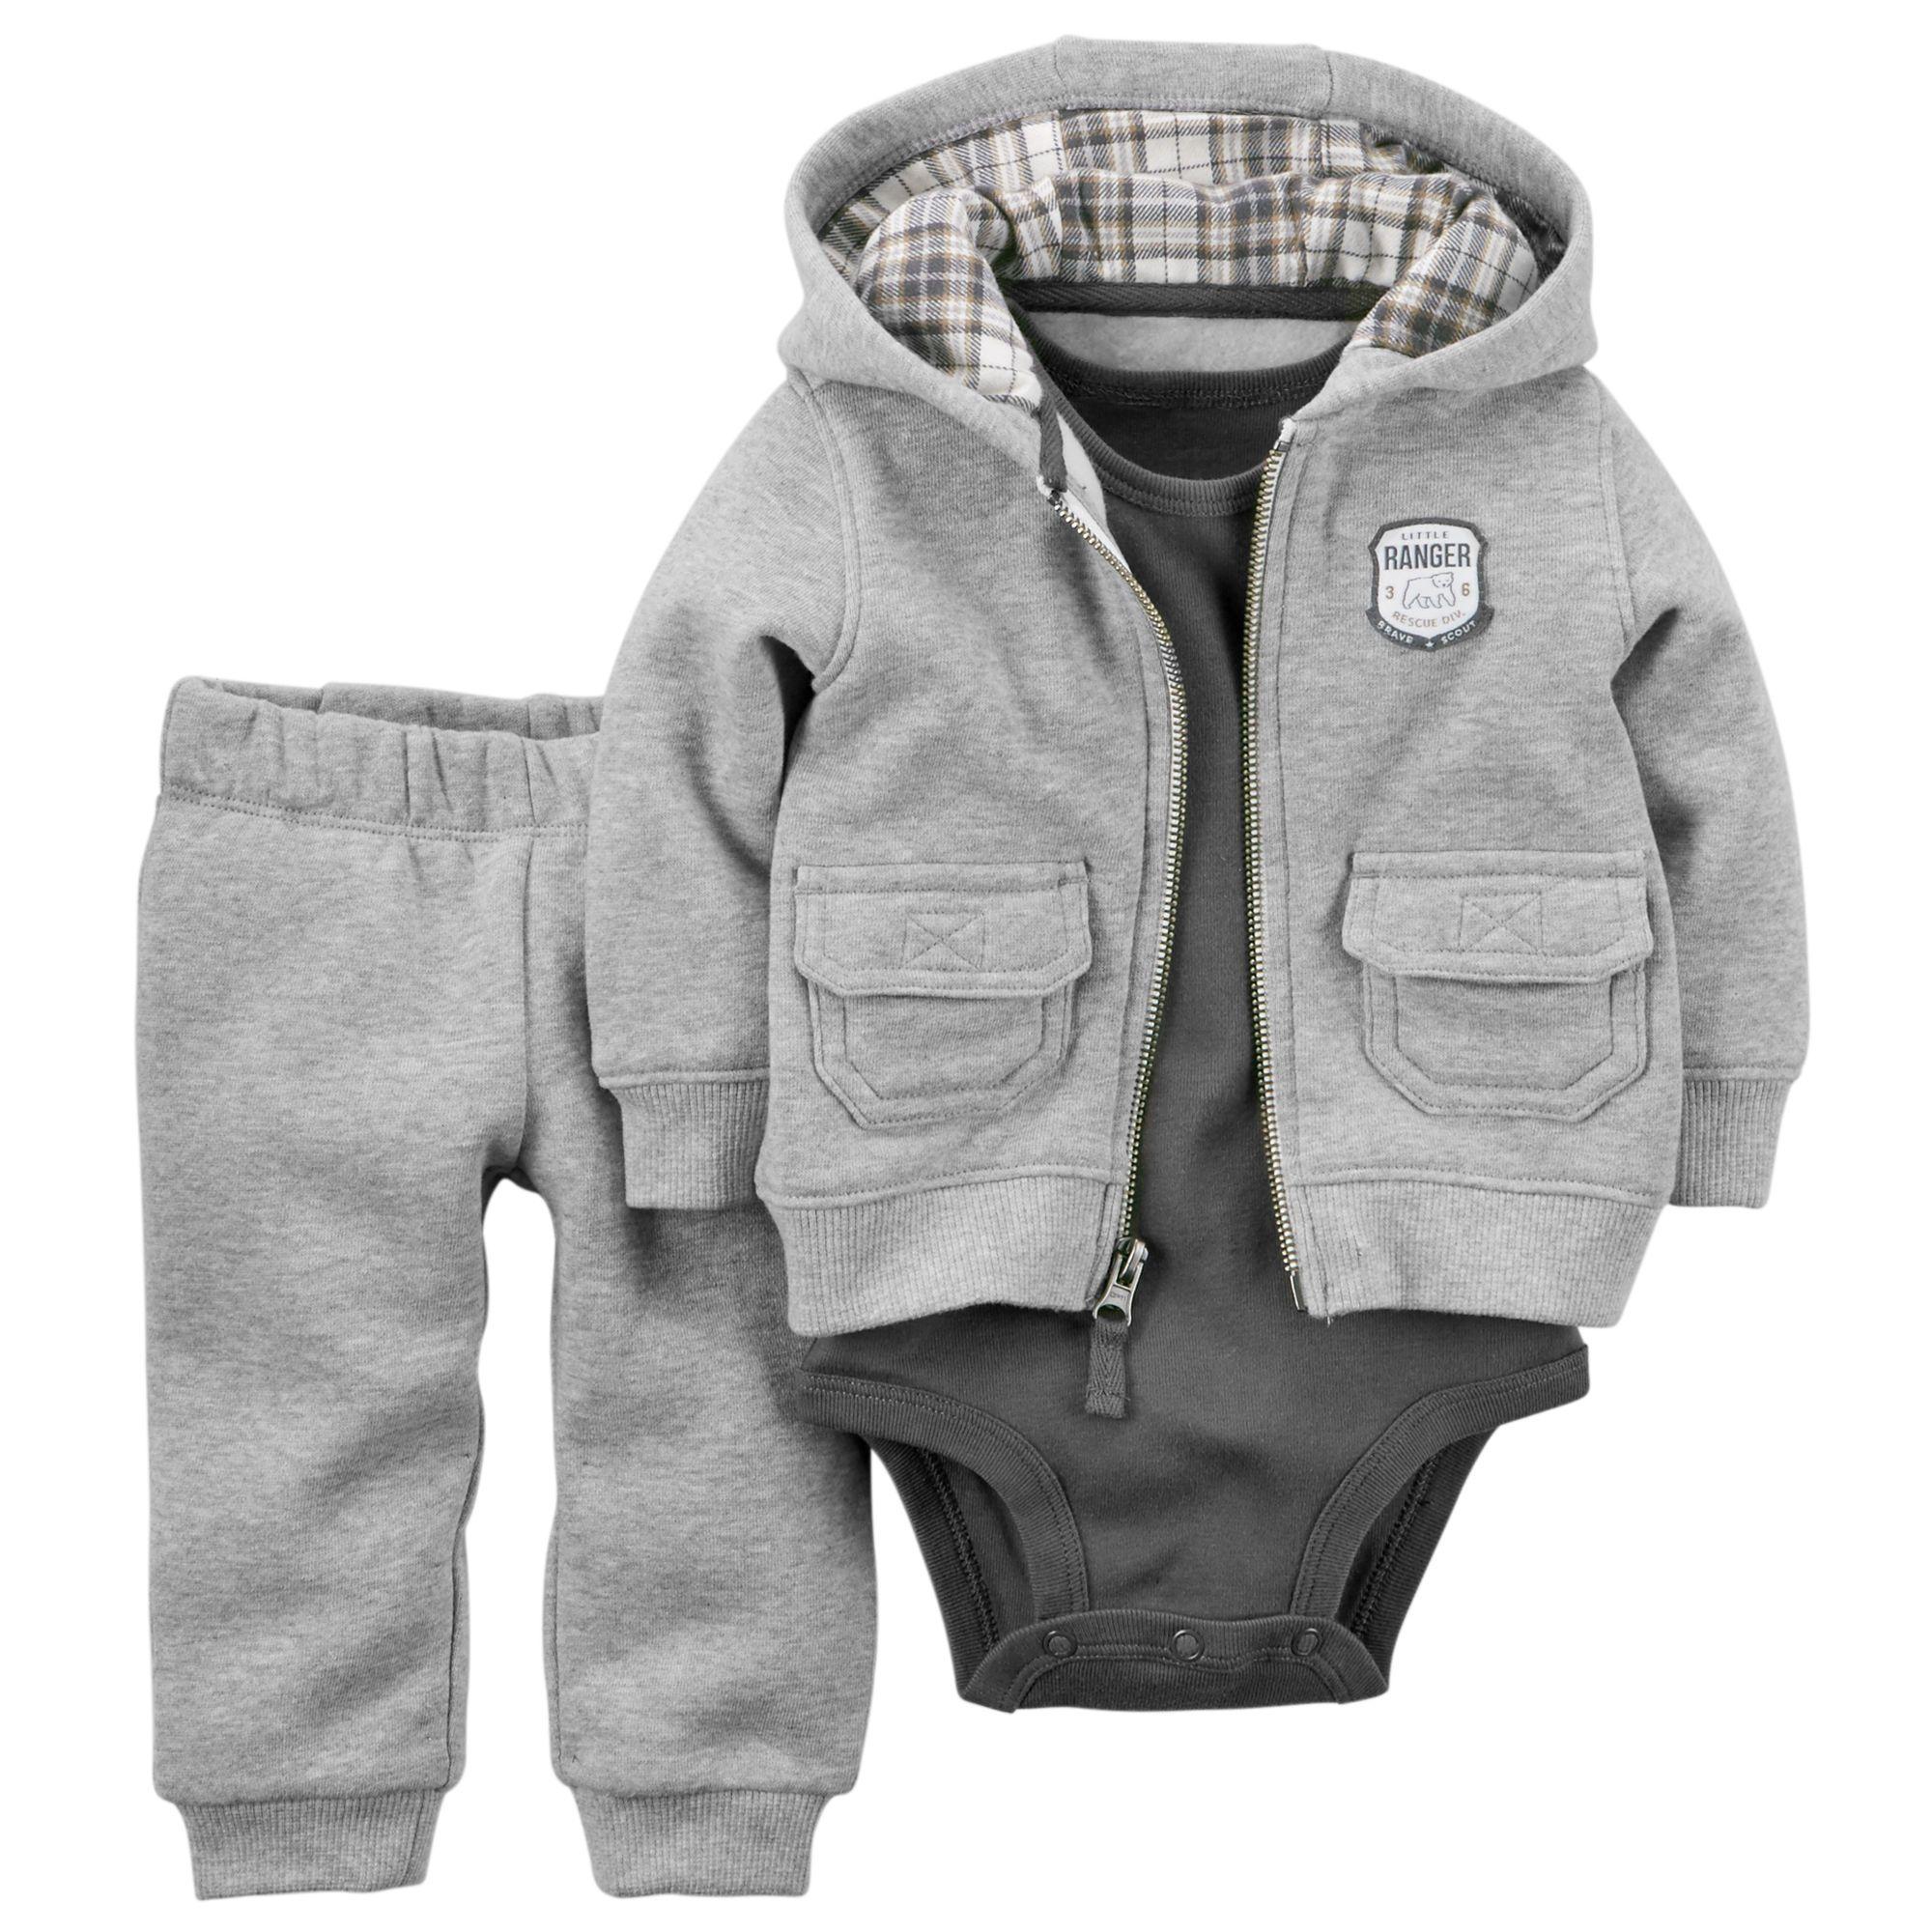 3 Piece Hooded Fleece Cardigan Set